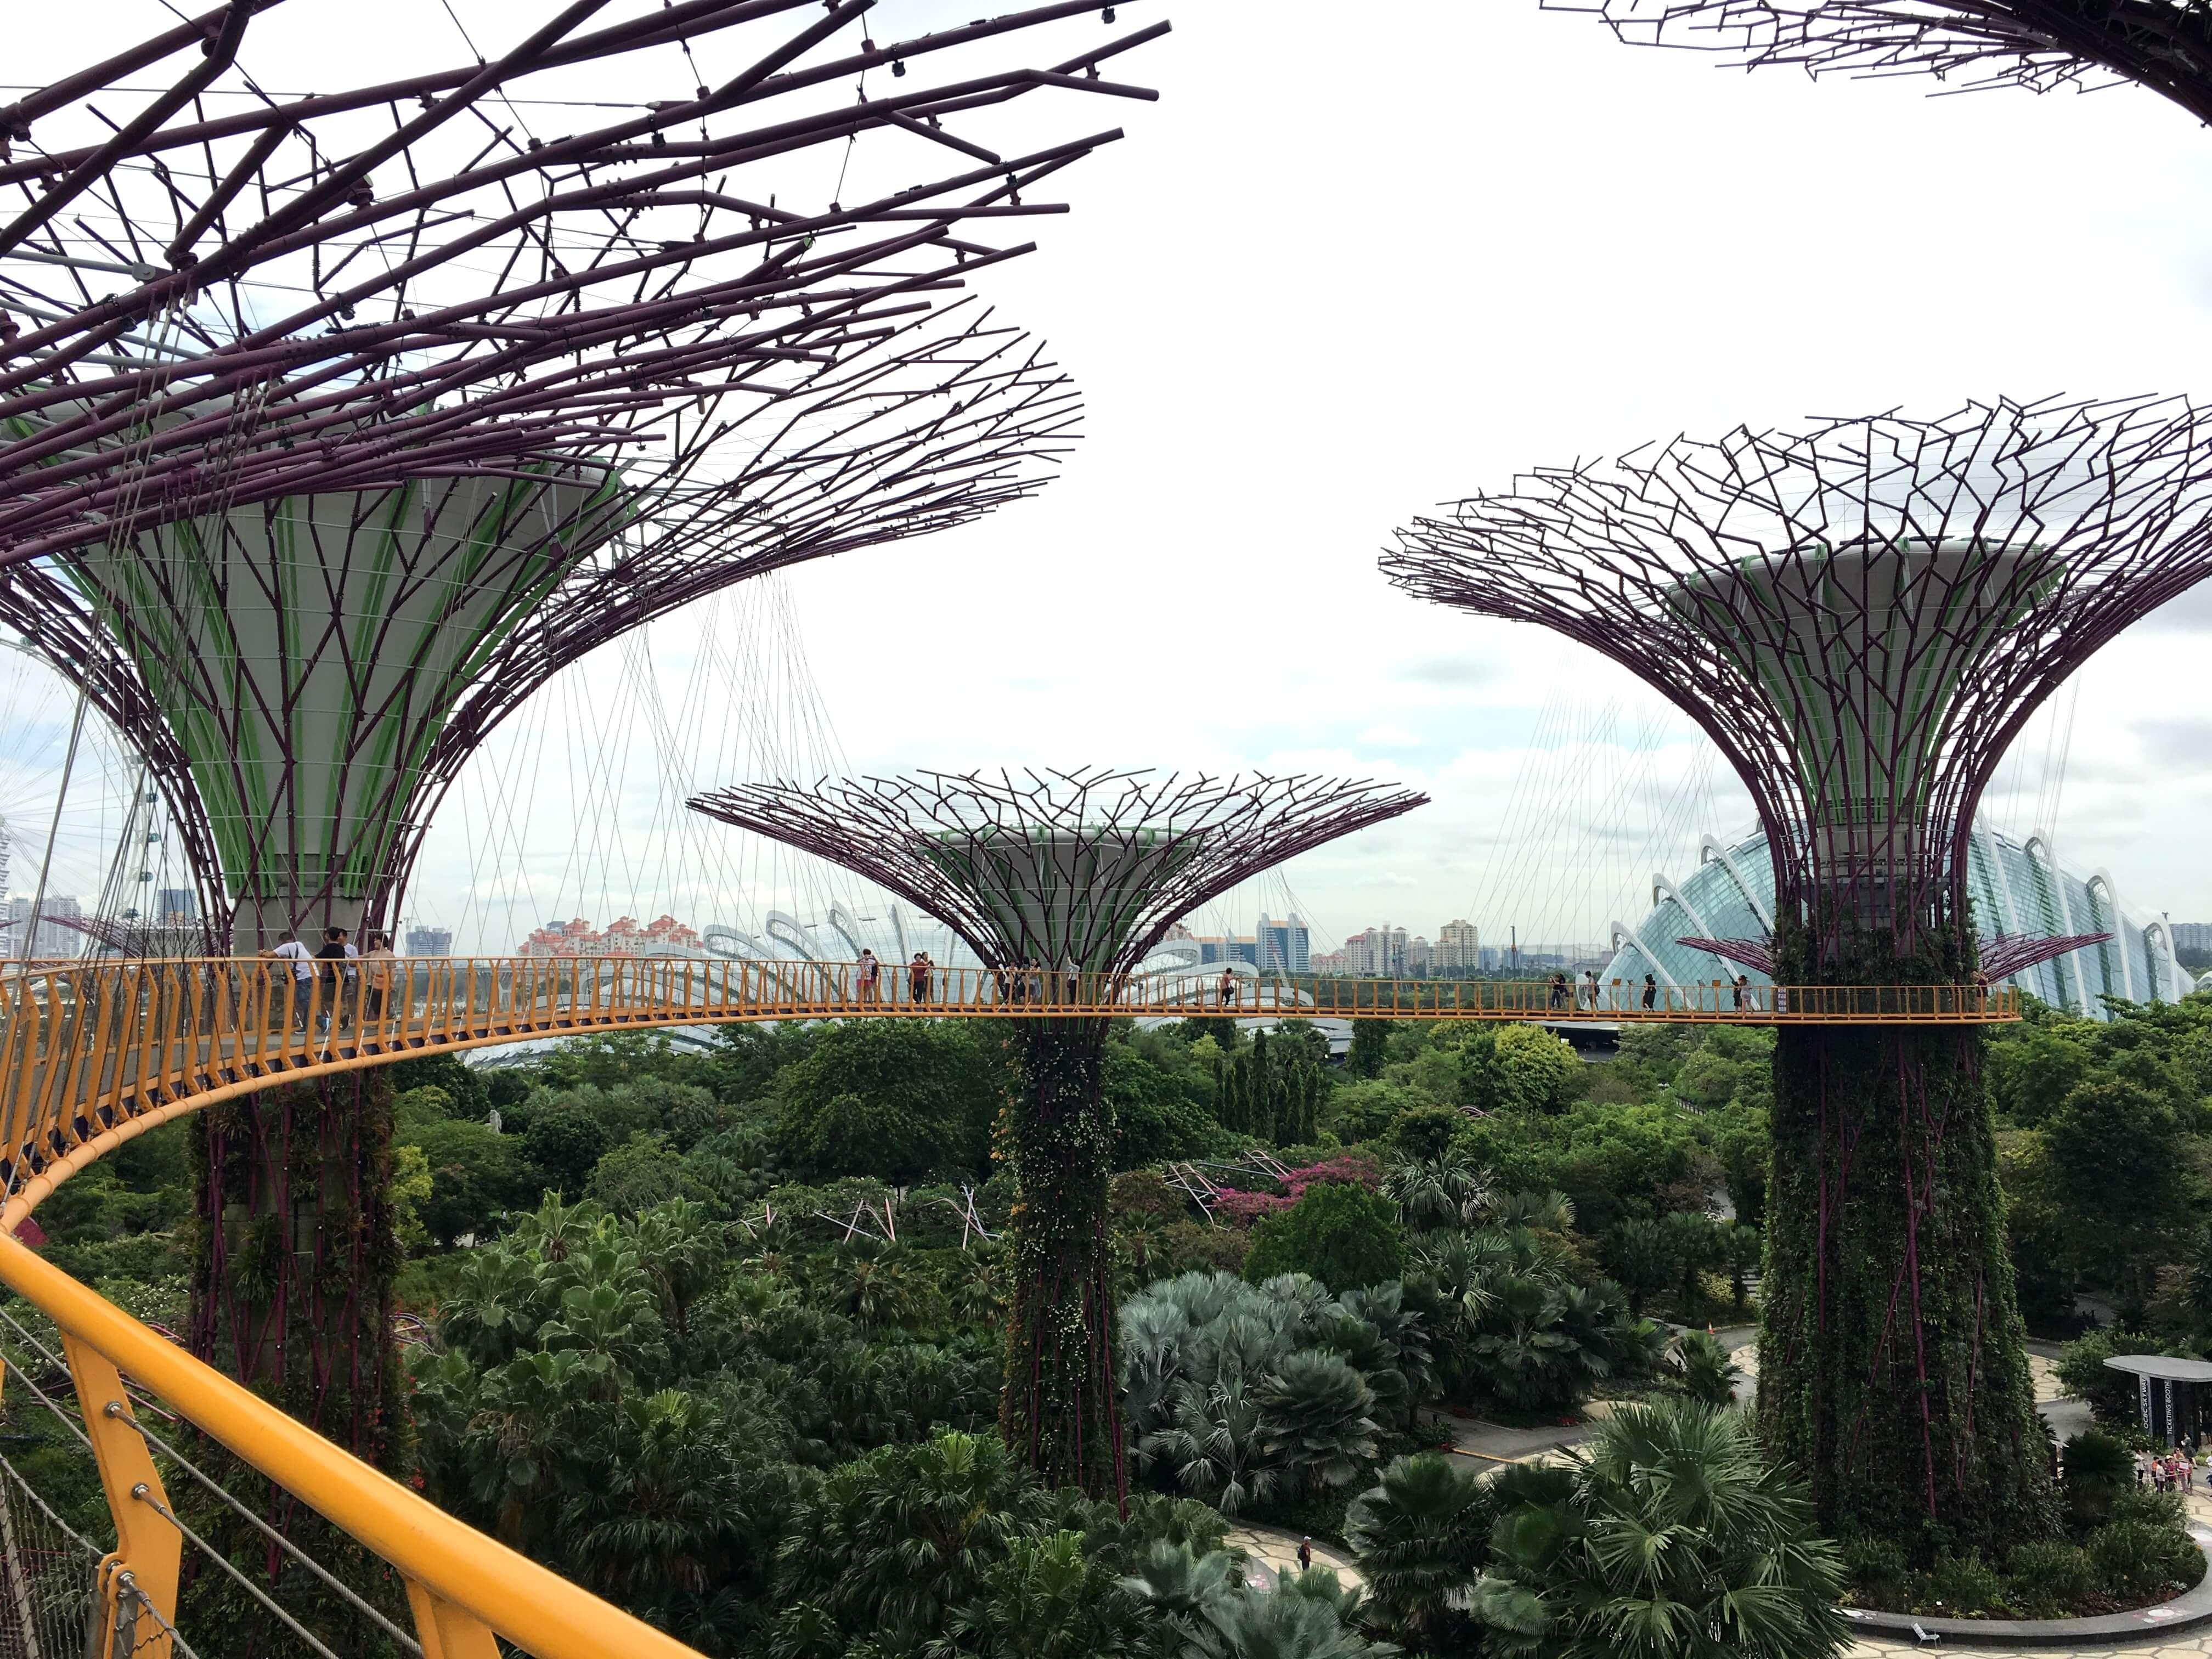 singapur-reisetagebuch-gardens-by-the-bay-makeupinflight-3